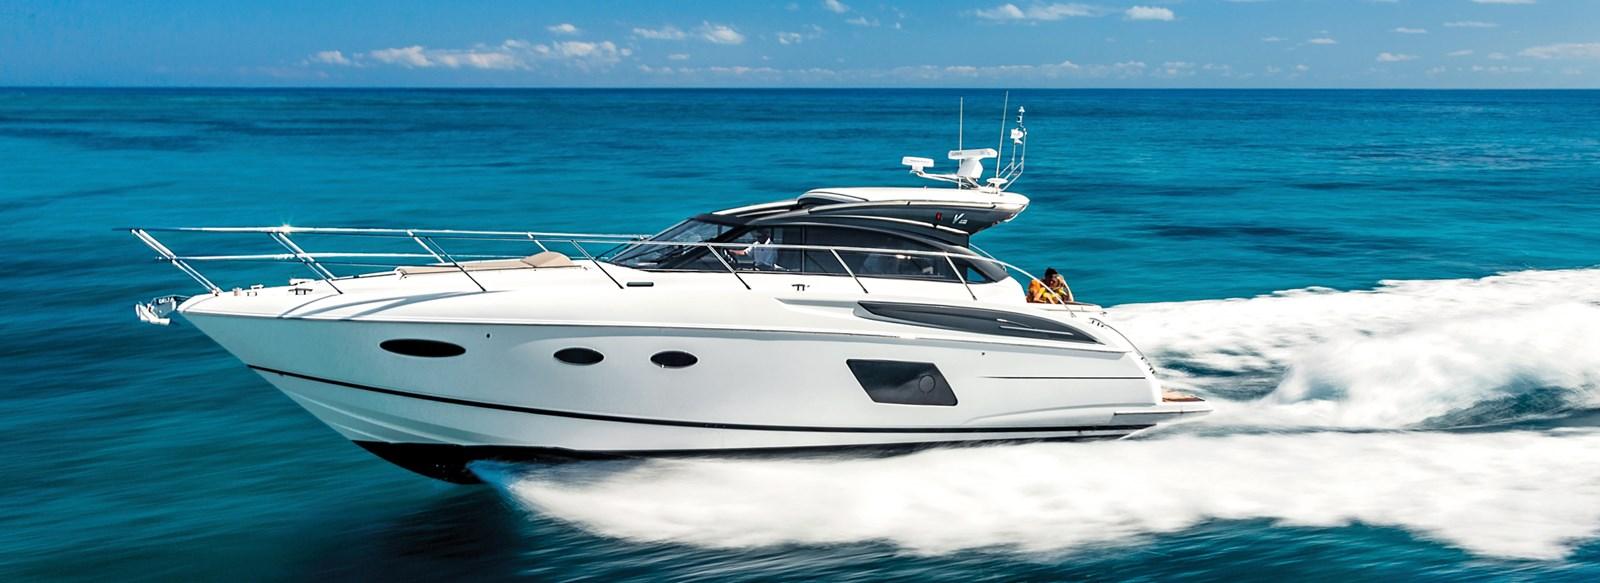 New Princess V48 Express Yachts For Sale